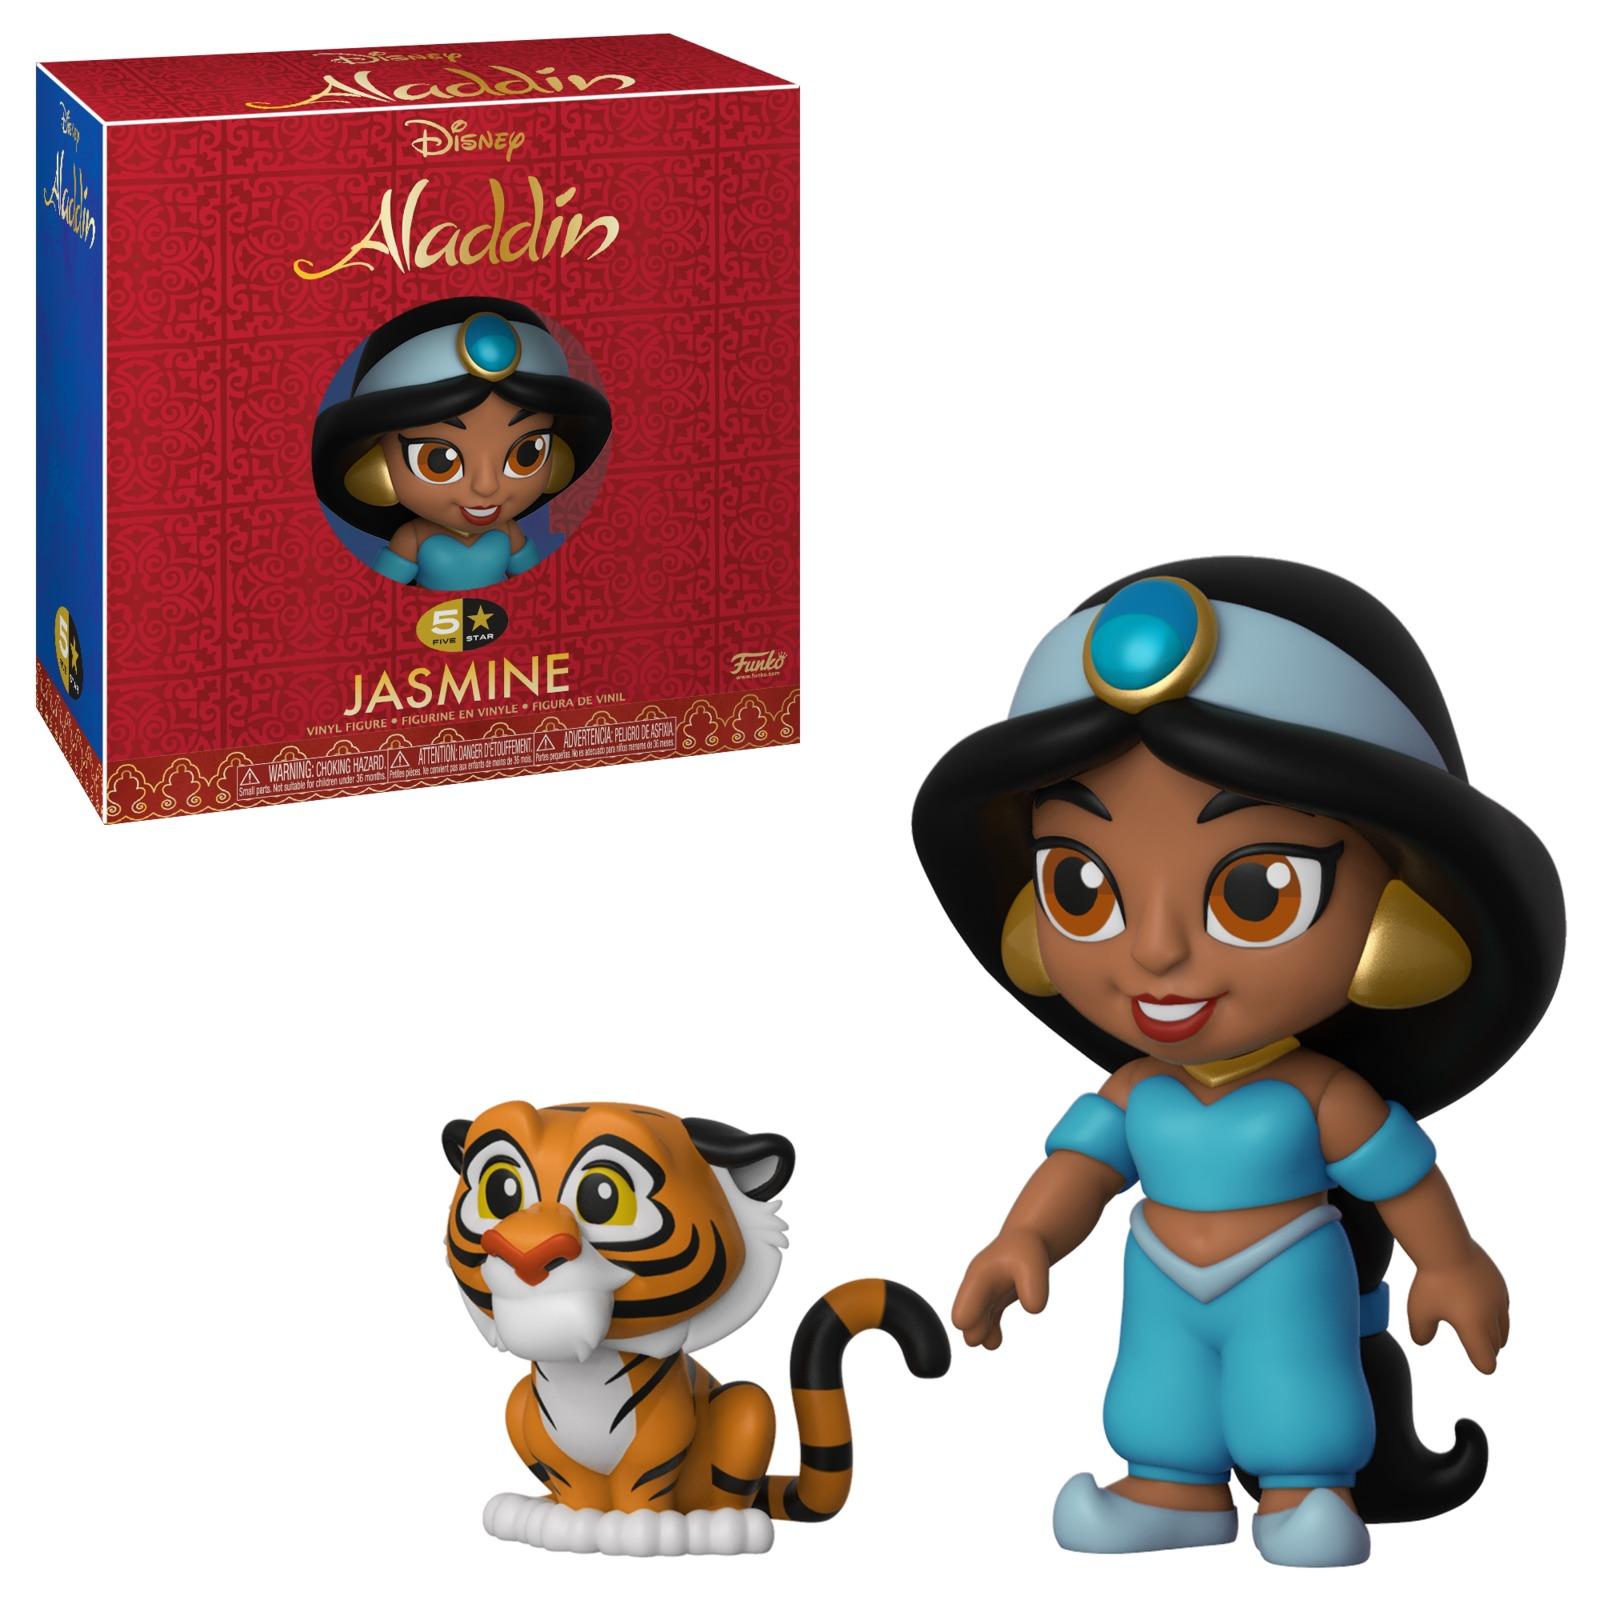 Aladdin: Jasmine with Rajah - 5-Star Vinyl Figure image